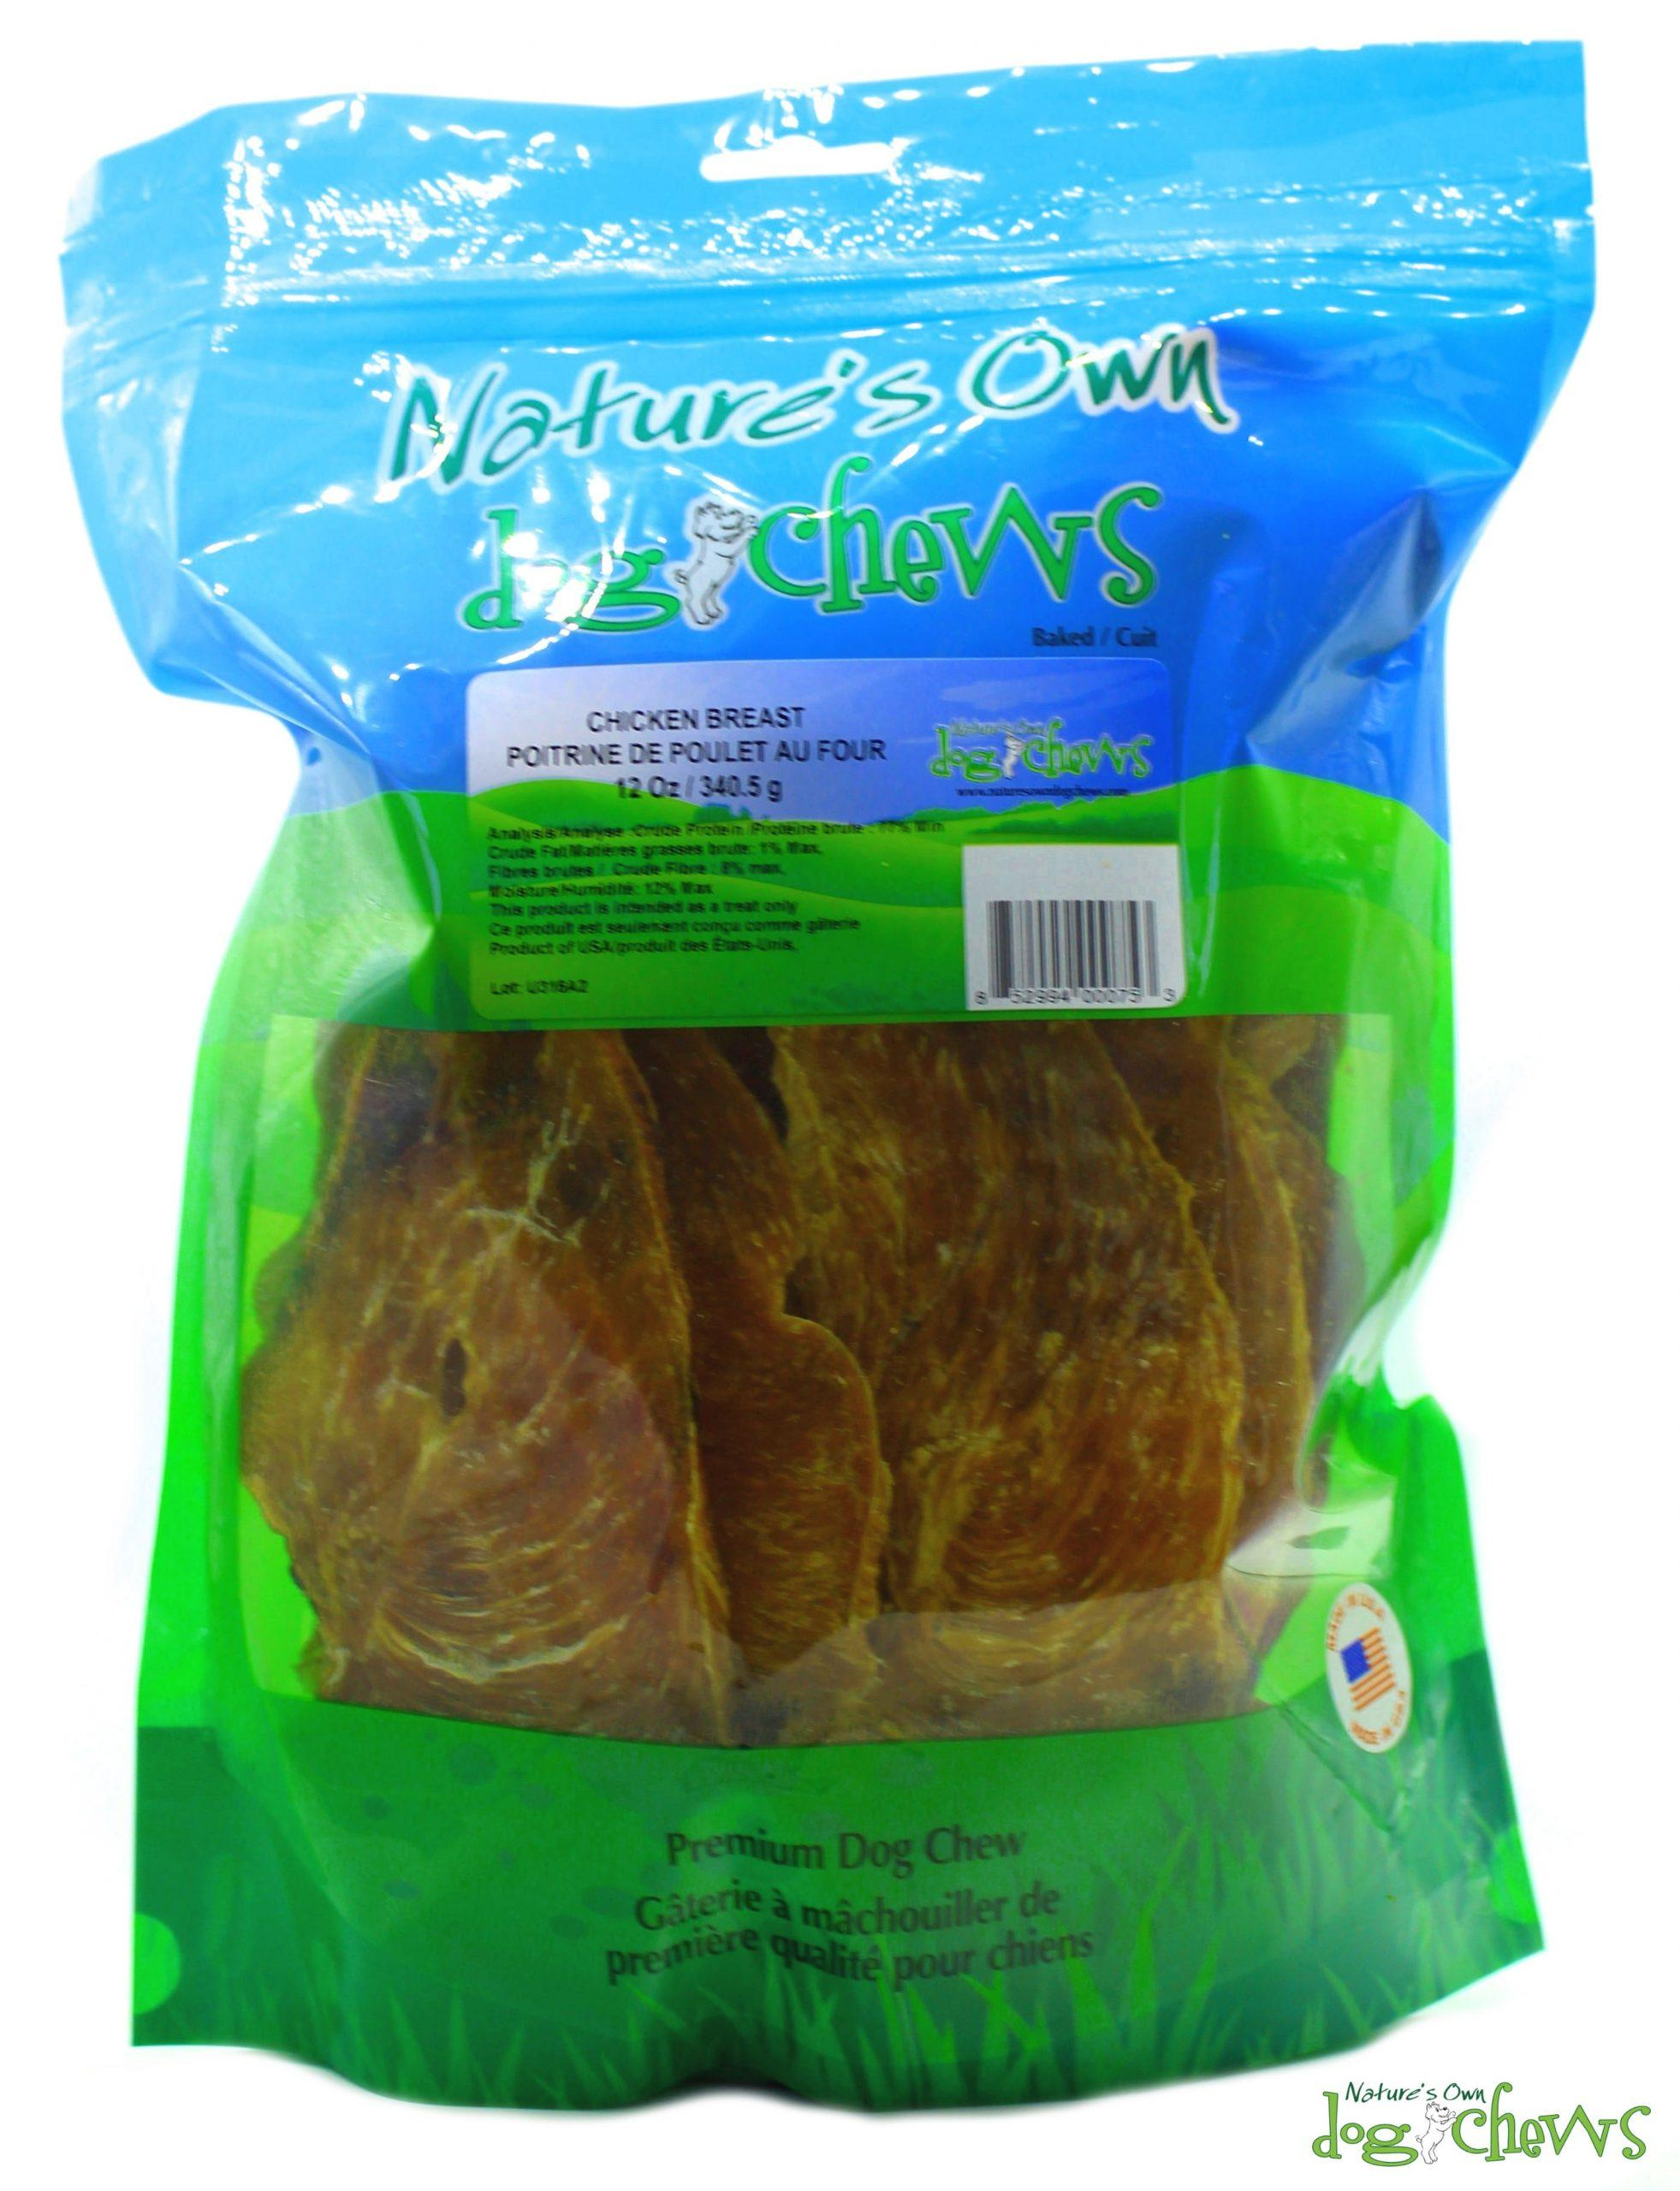 Nature's Own Dog Chews Chicken Breast Dog Treats, 12-oz